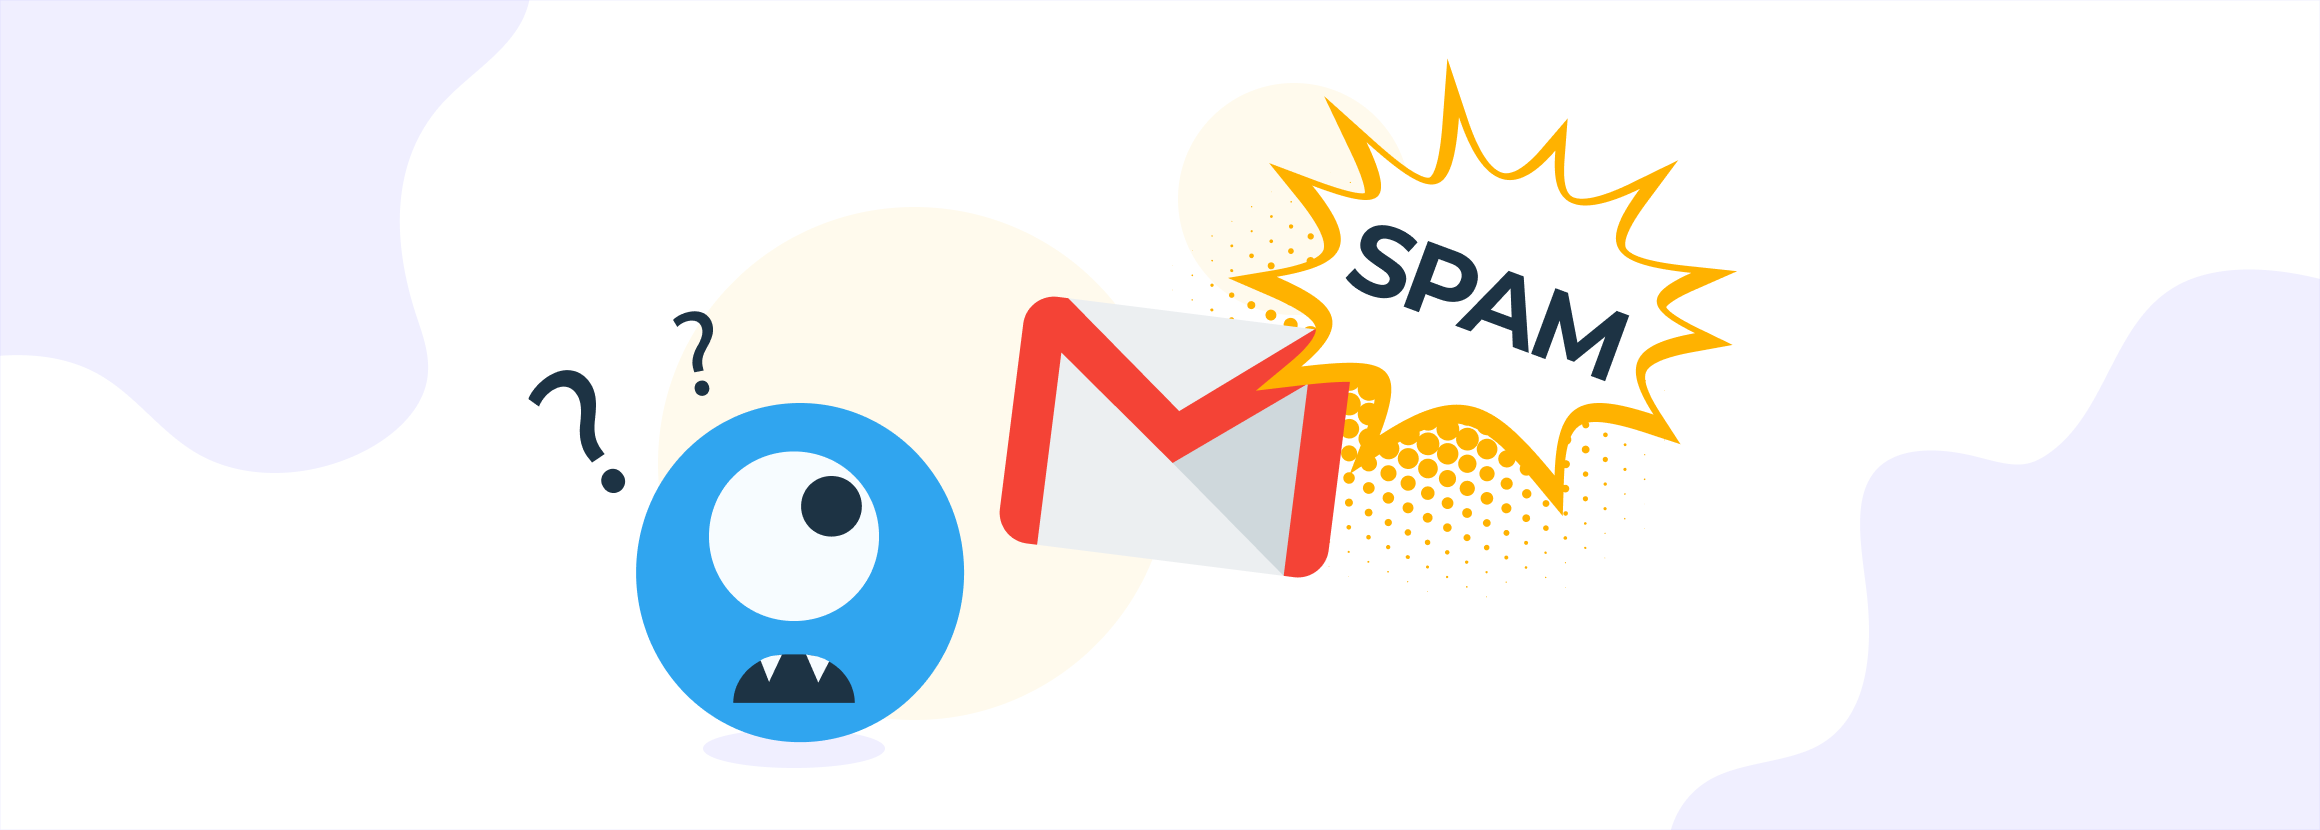 Gmail deliverability